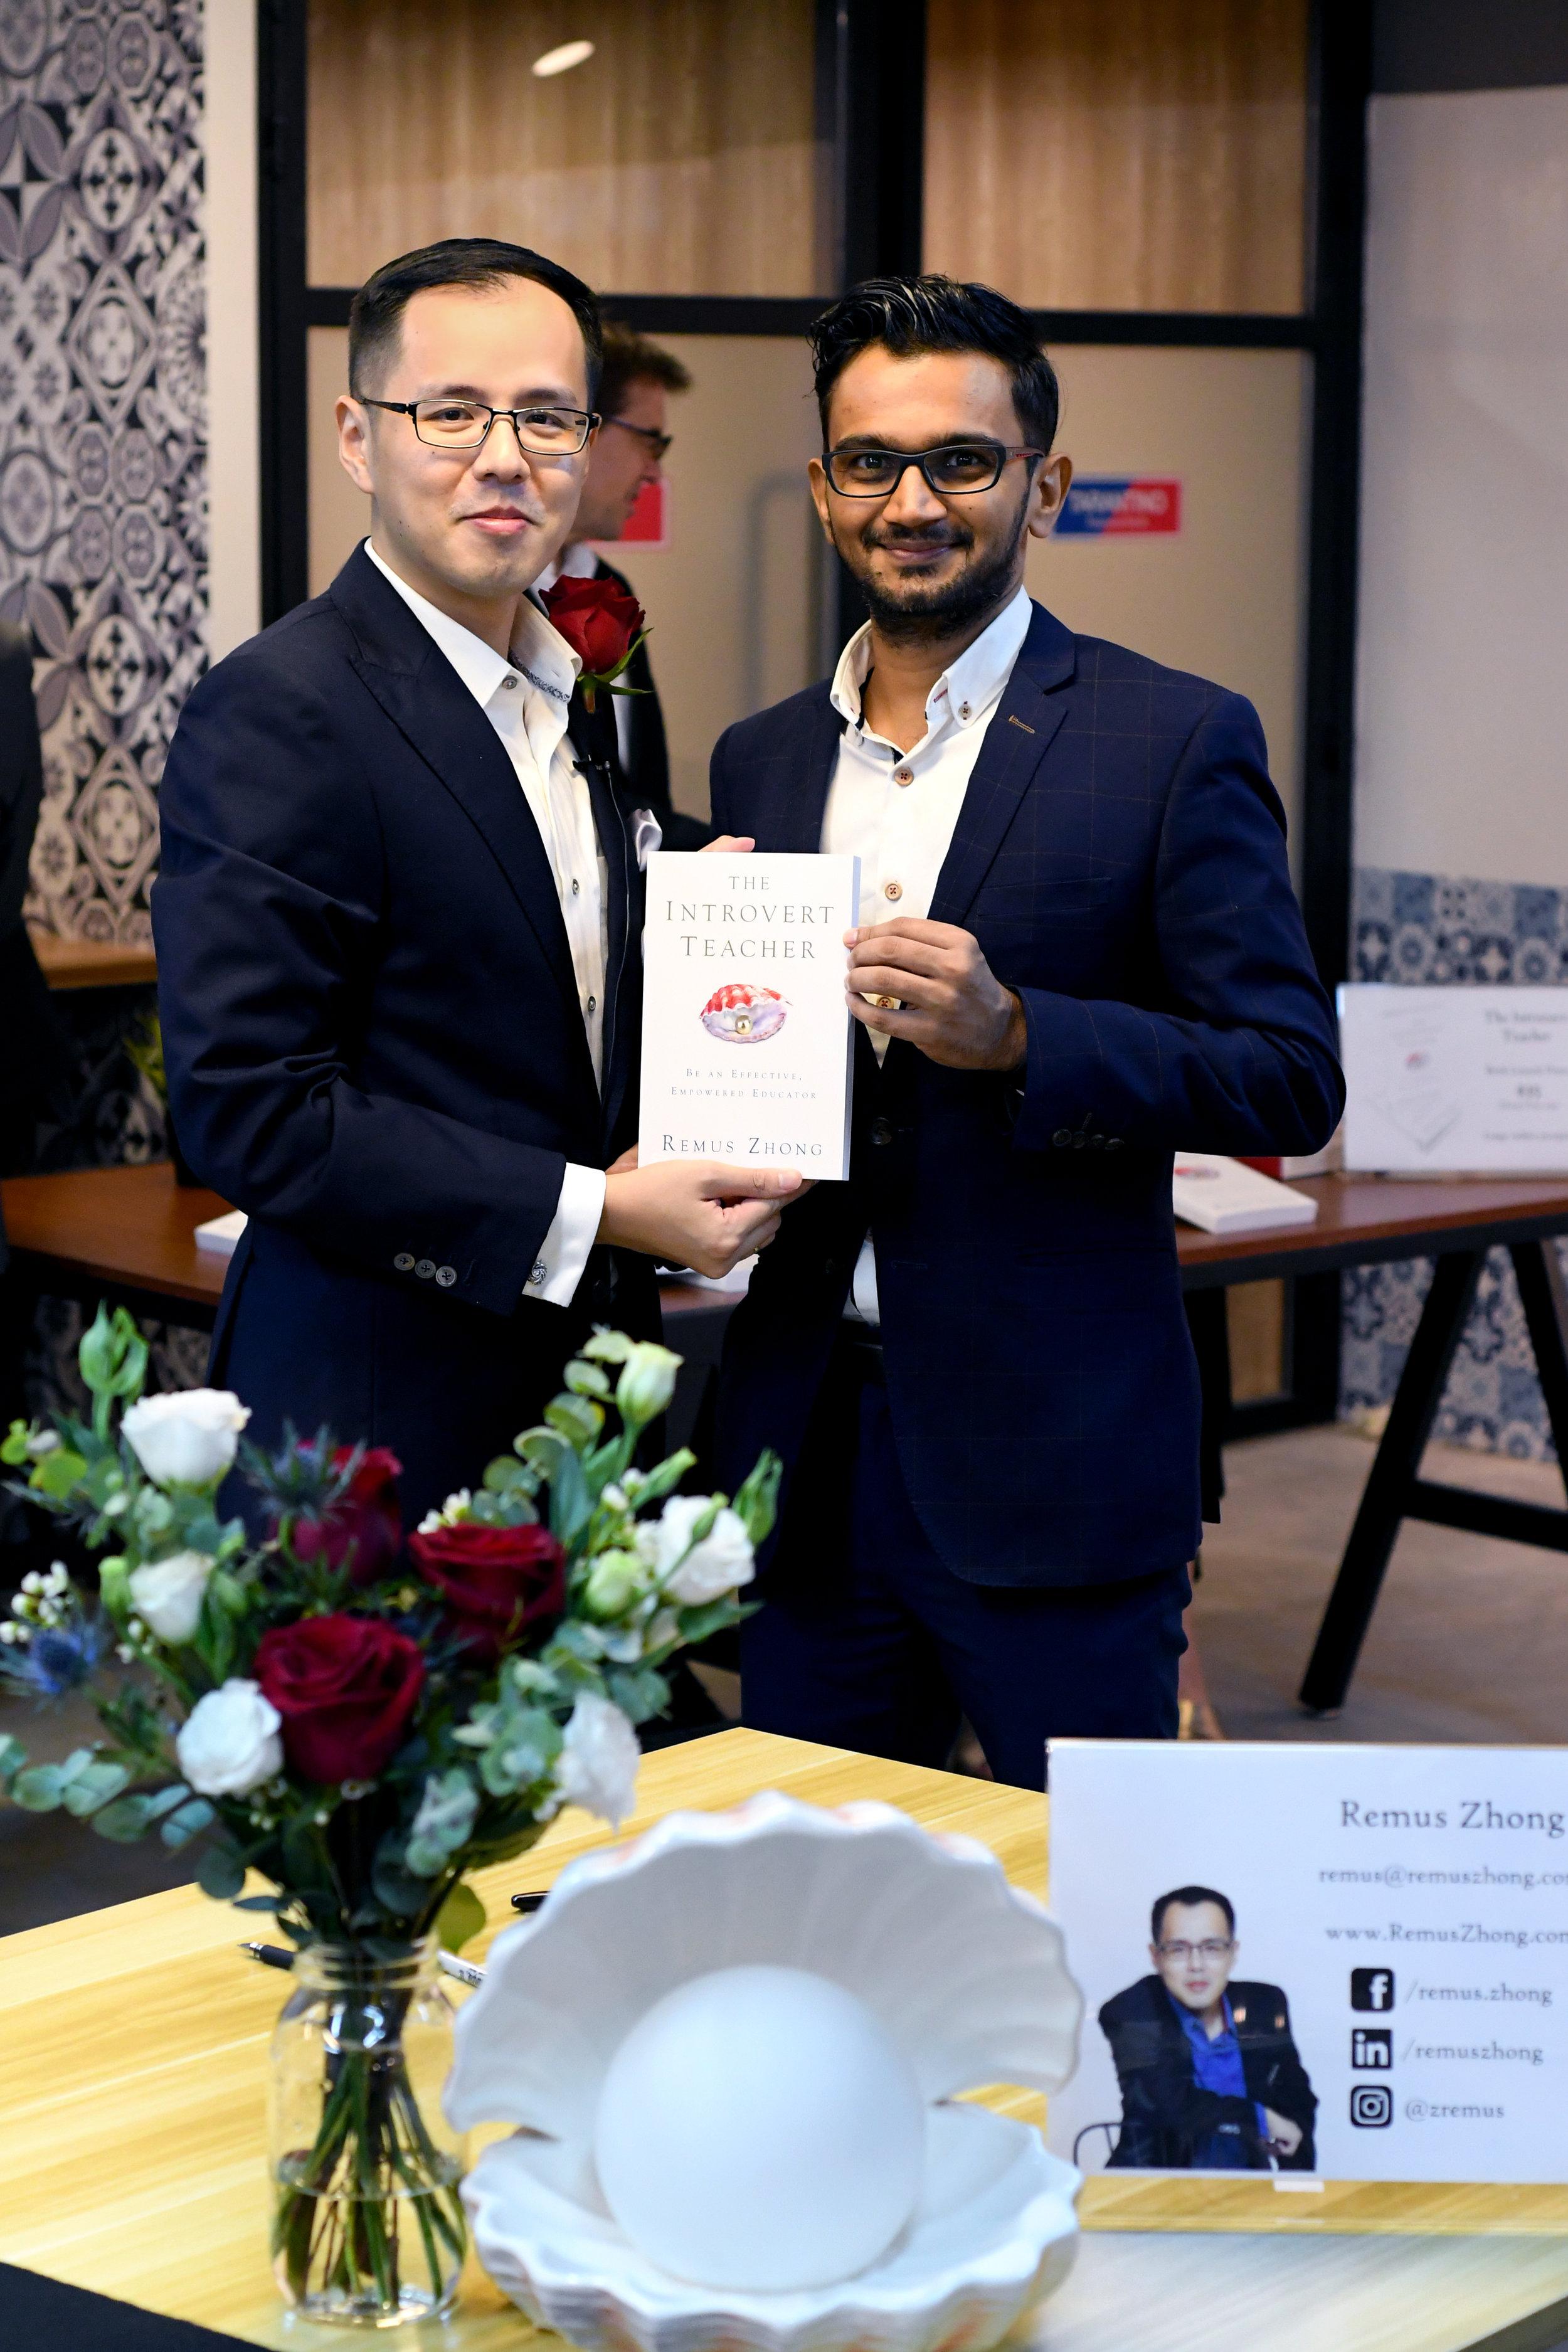 With Kalyan Bhatlapenumerthy